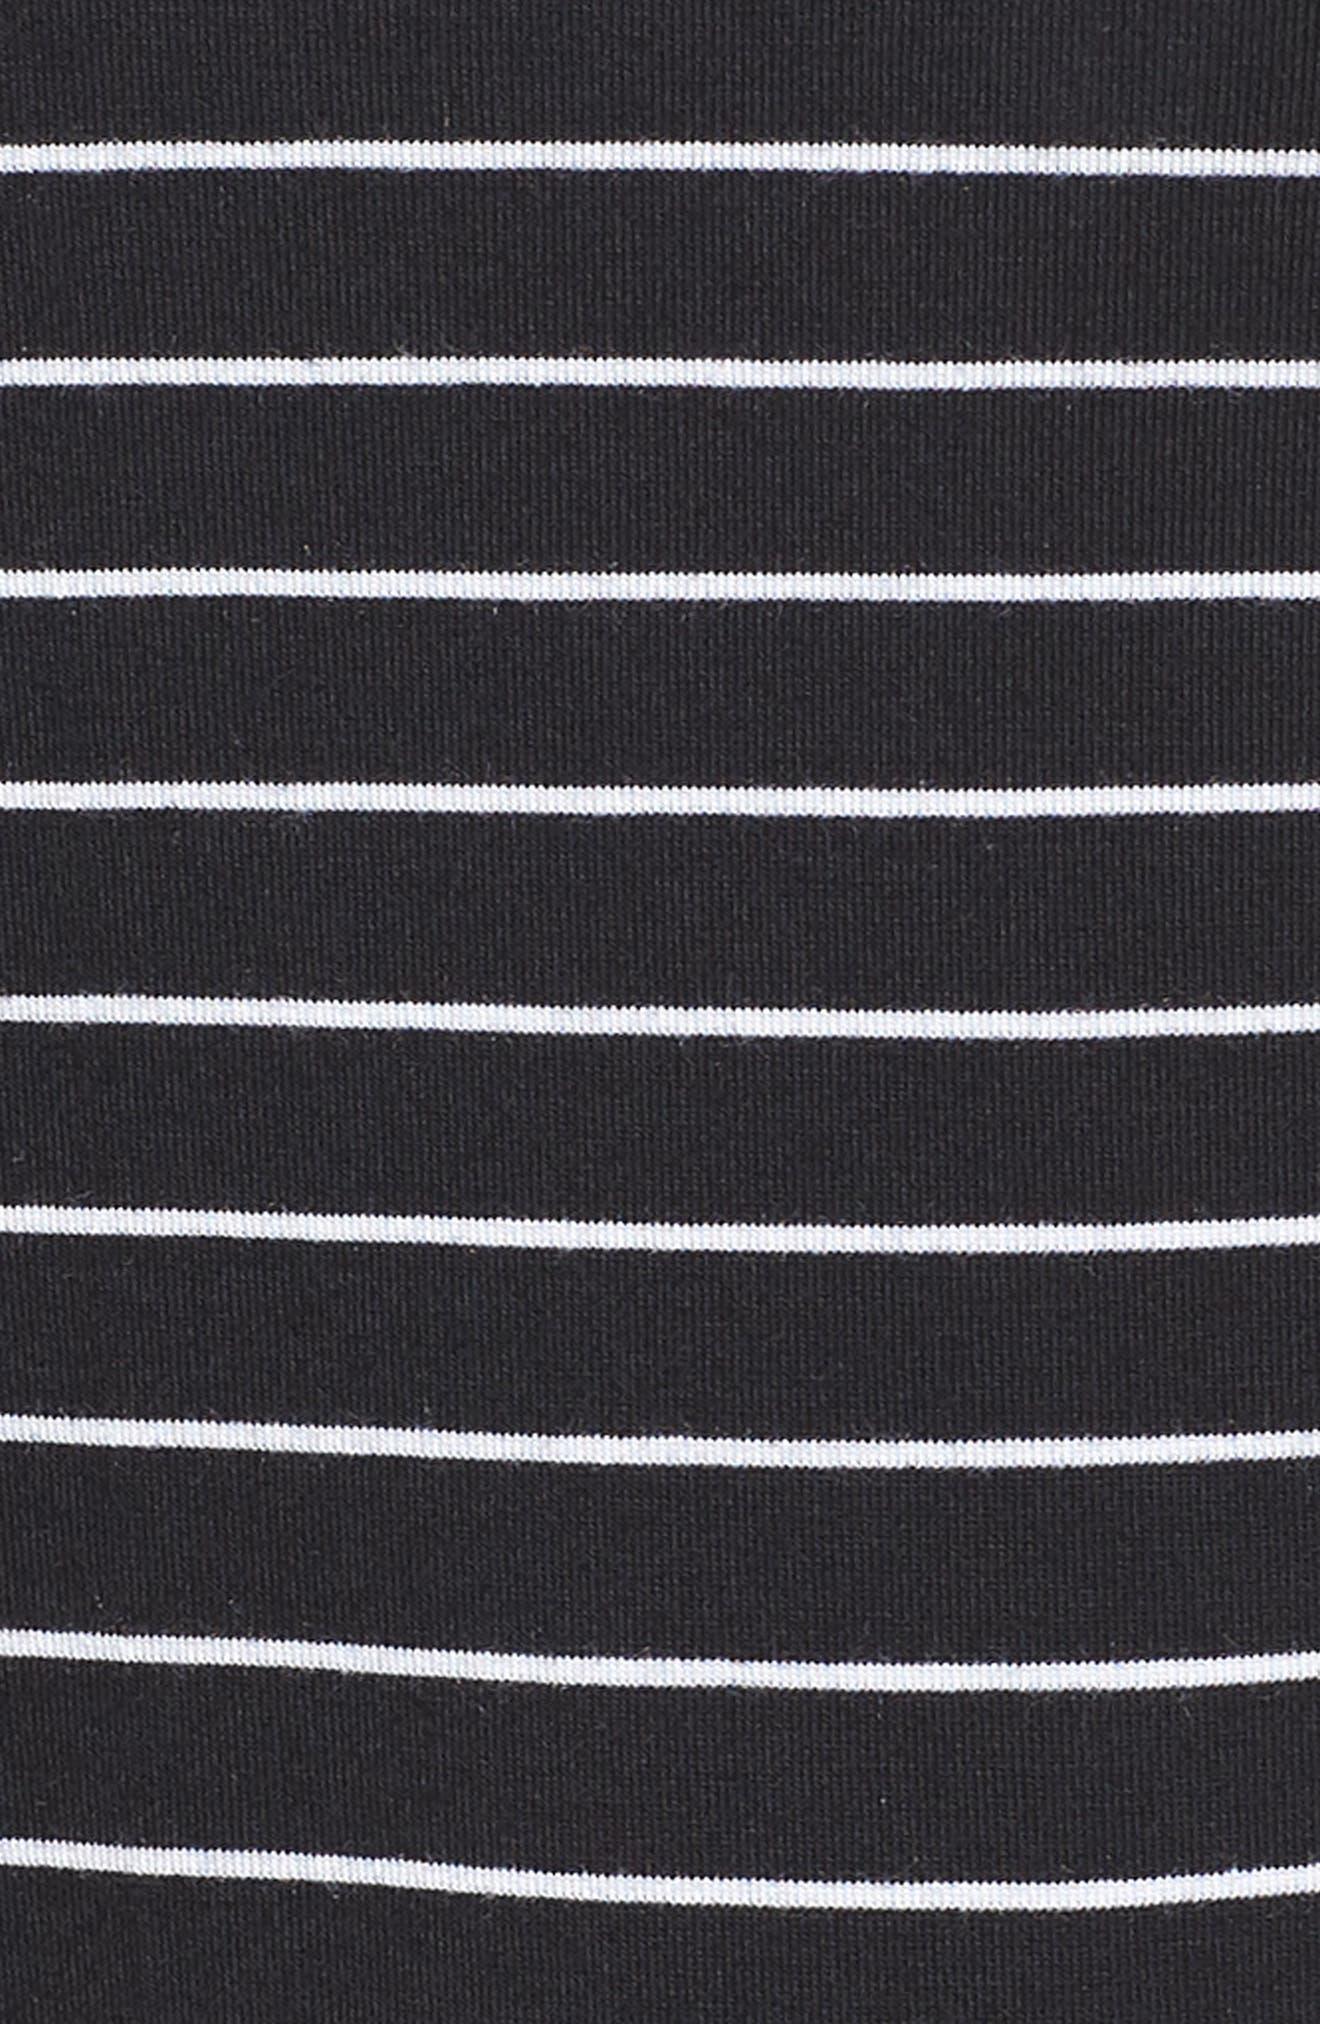 Mesh Inset Sleeve Tee,                             Alternate thumbnail 6, color,                             BLACK/ WHITE STRIPE